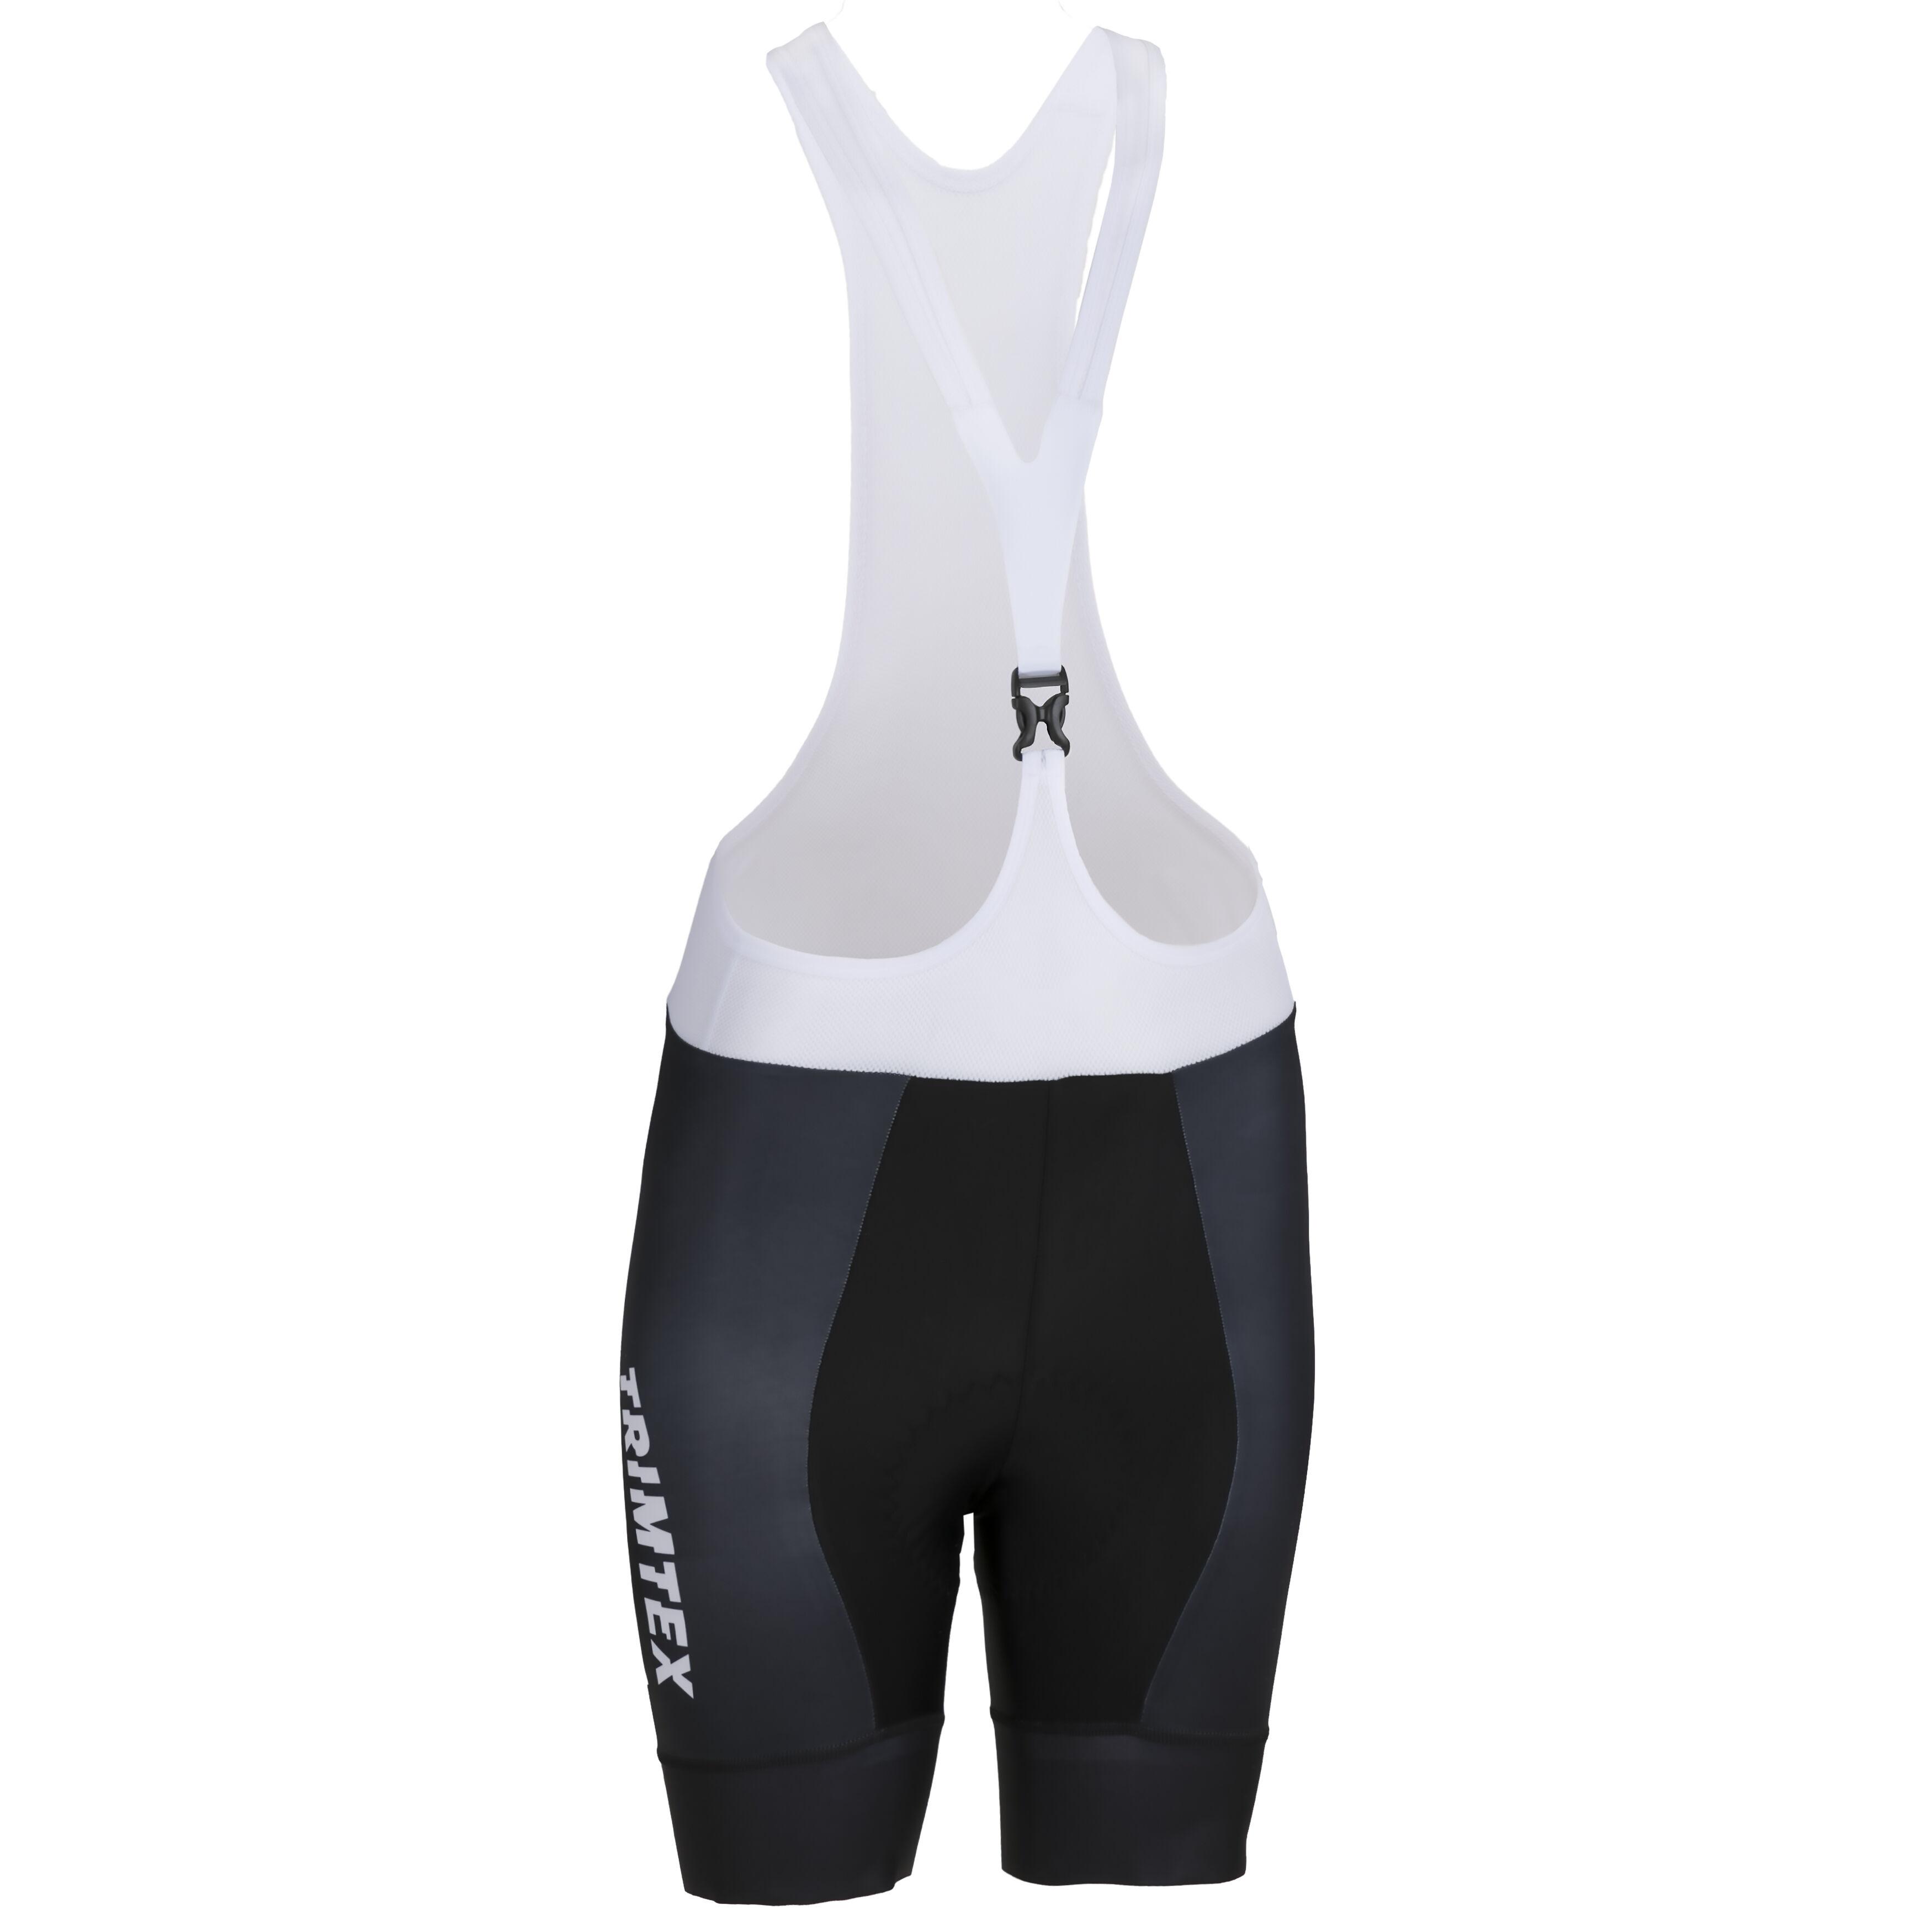 Cycling Bib Shorts Front Bib Tights Cycle Shorts Padded XS,S,M,L,XL,XXL